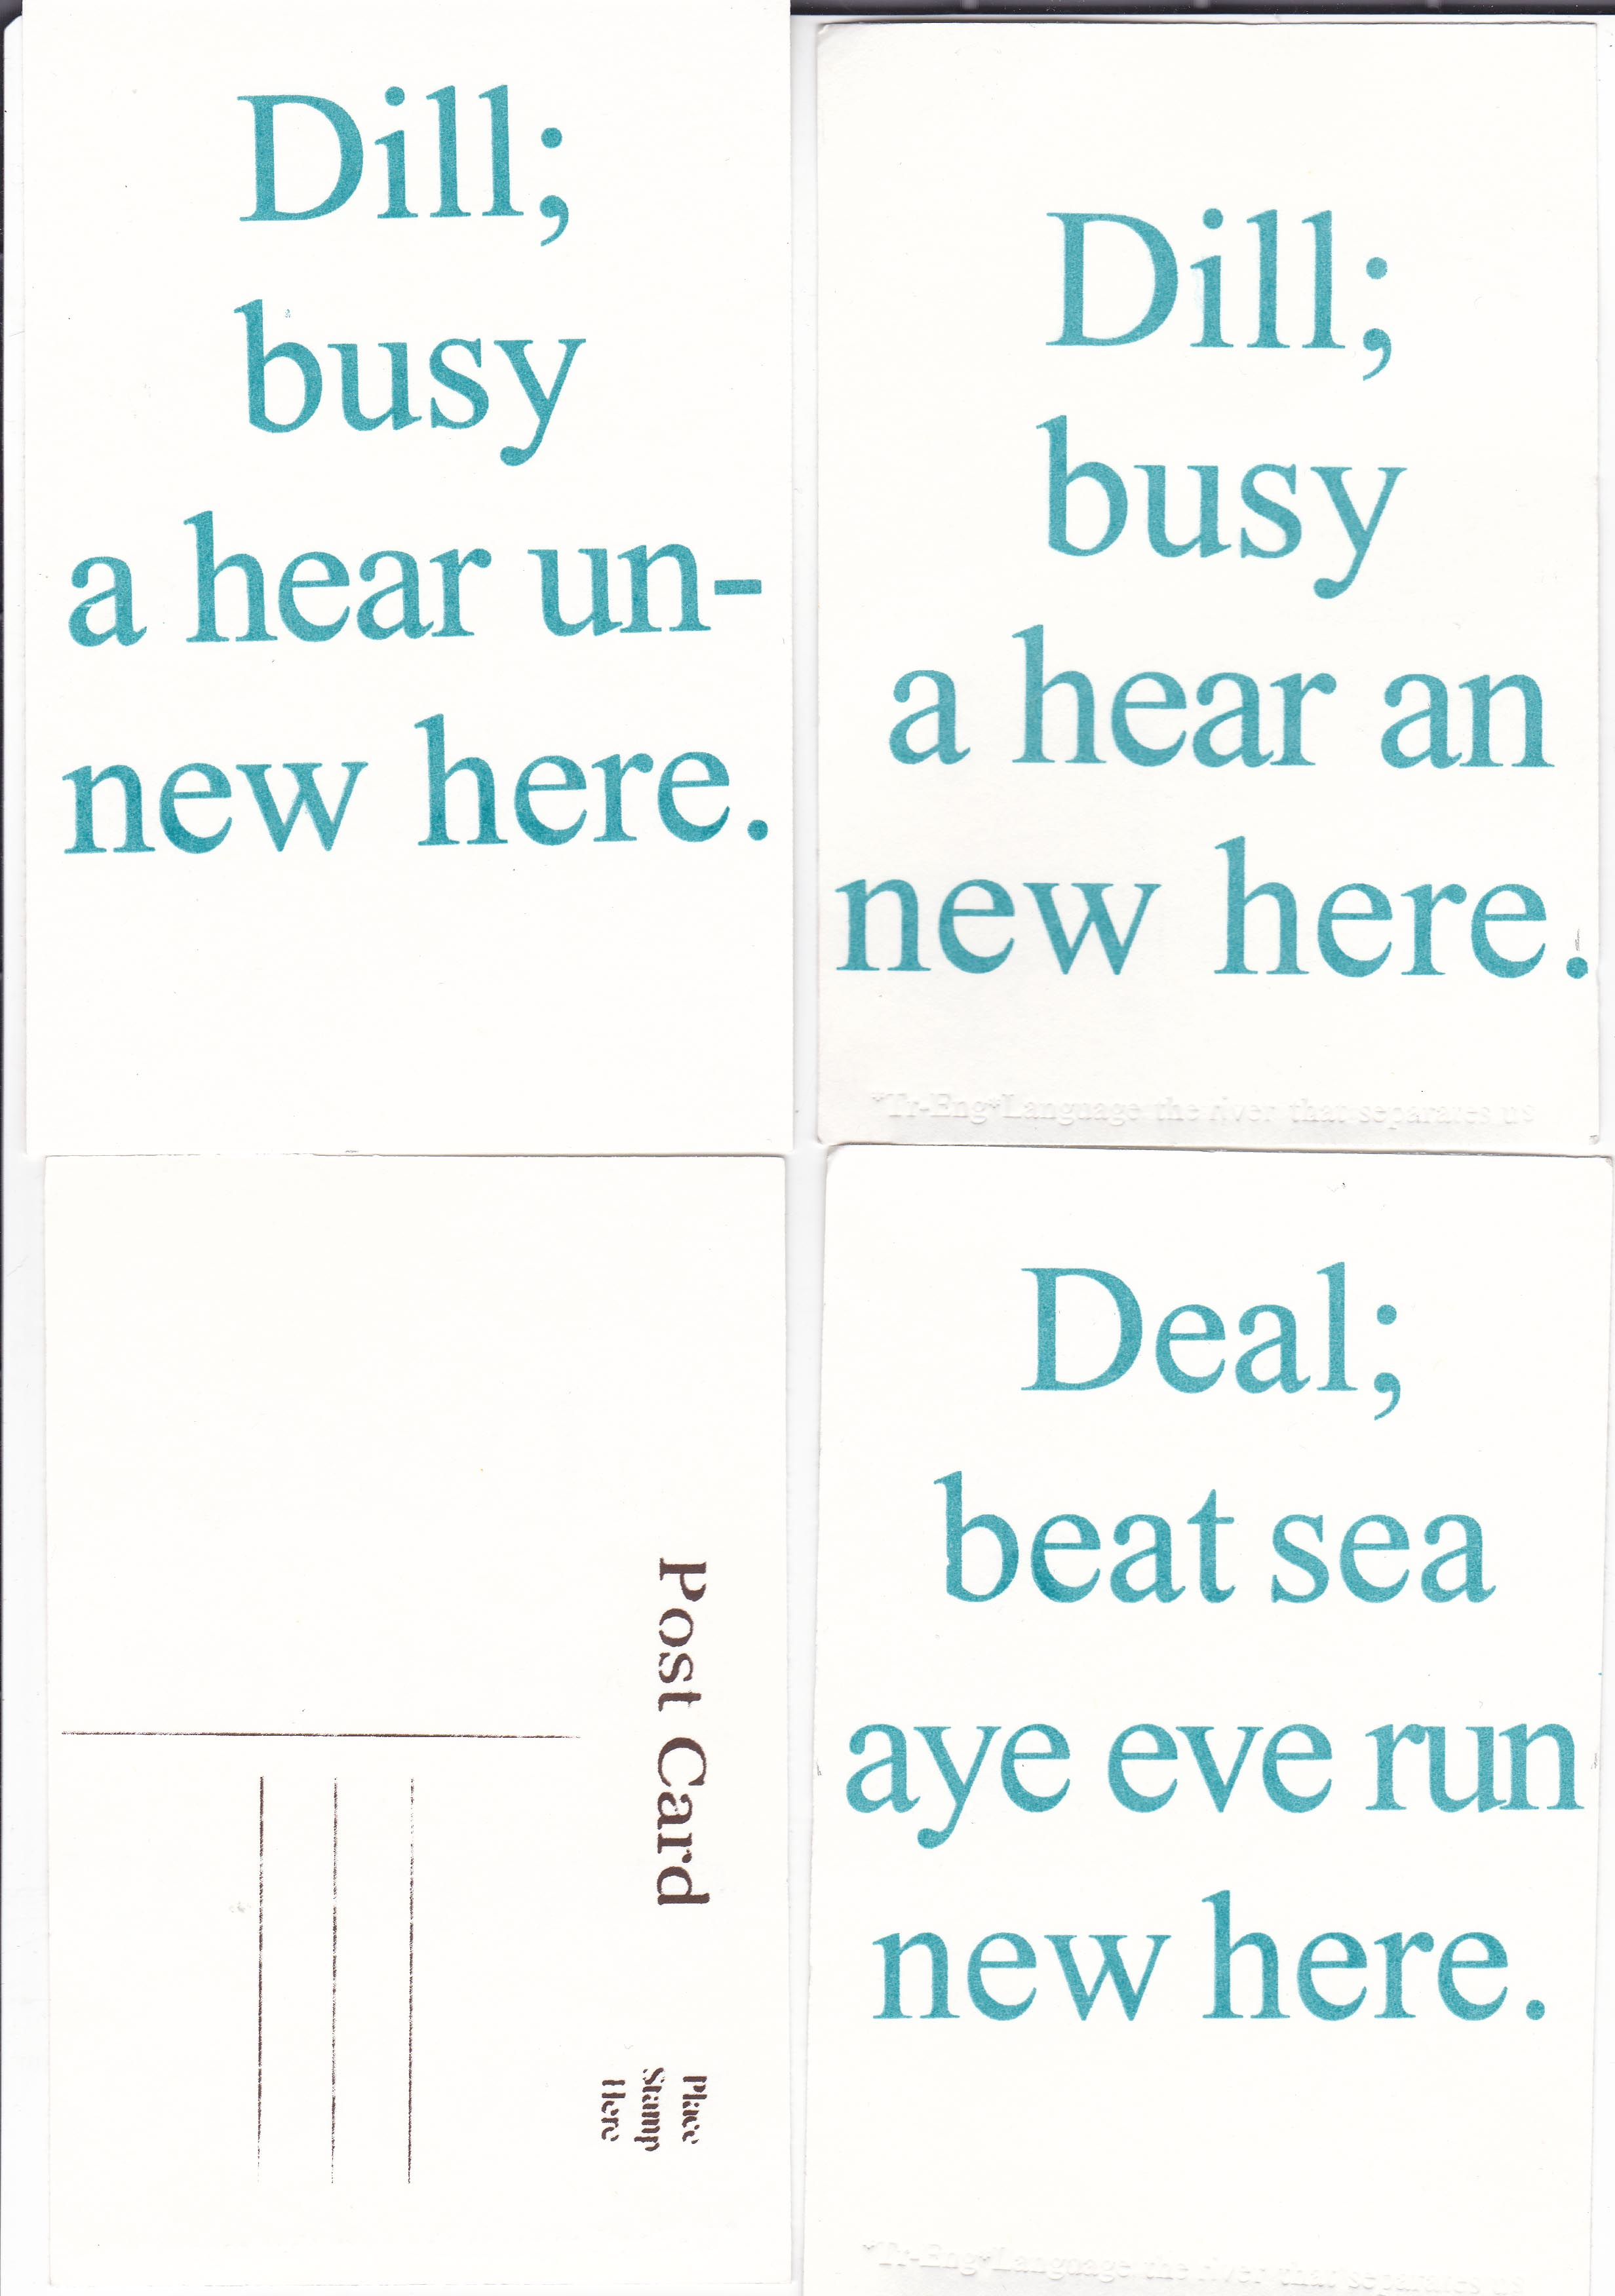 postcards2.jpg